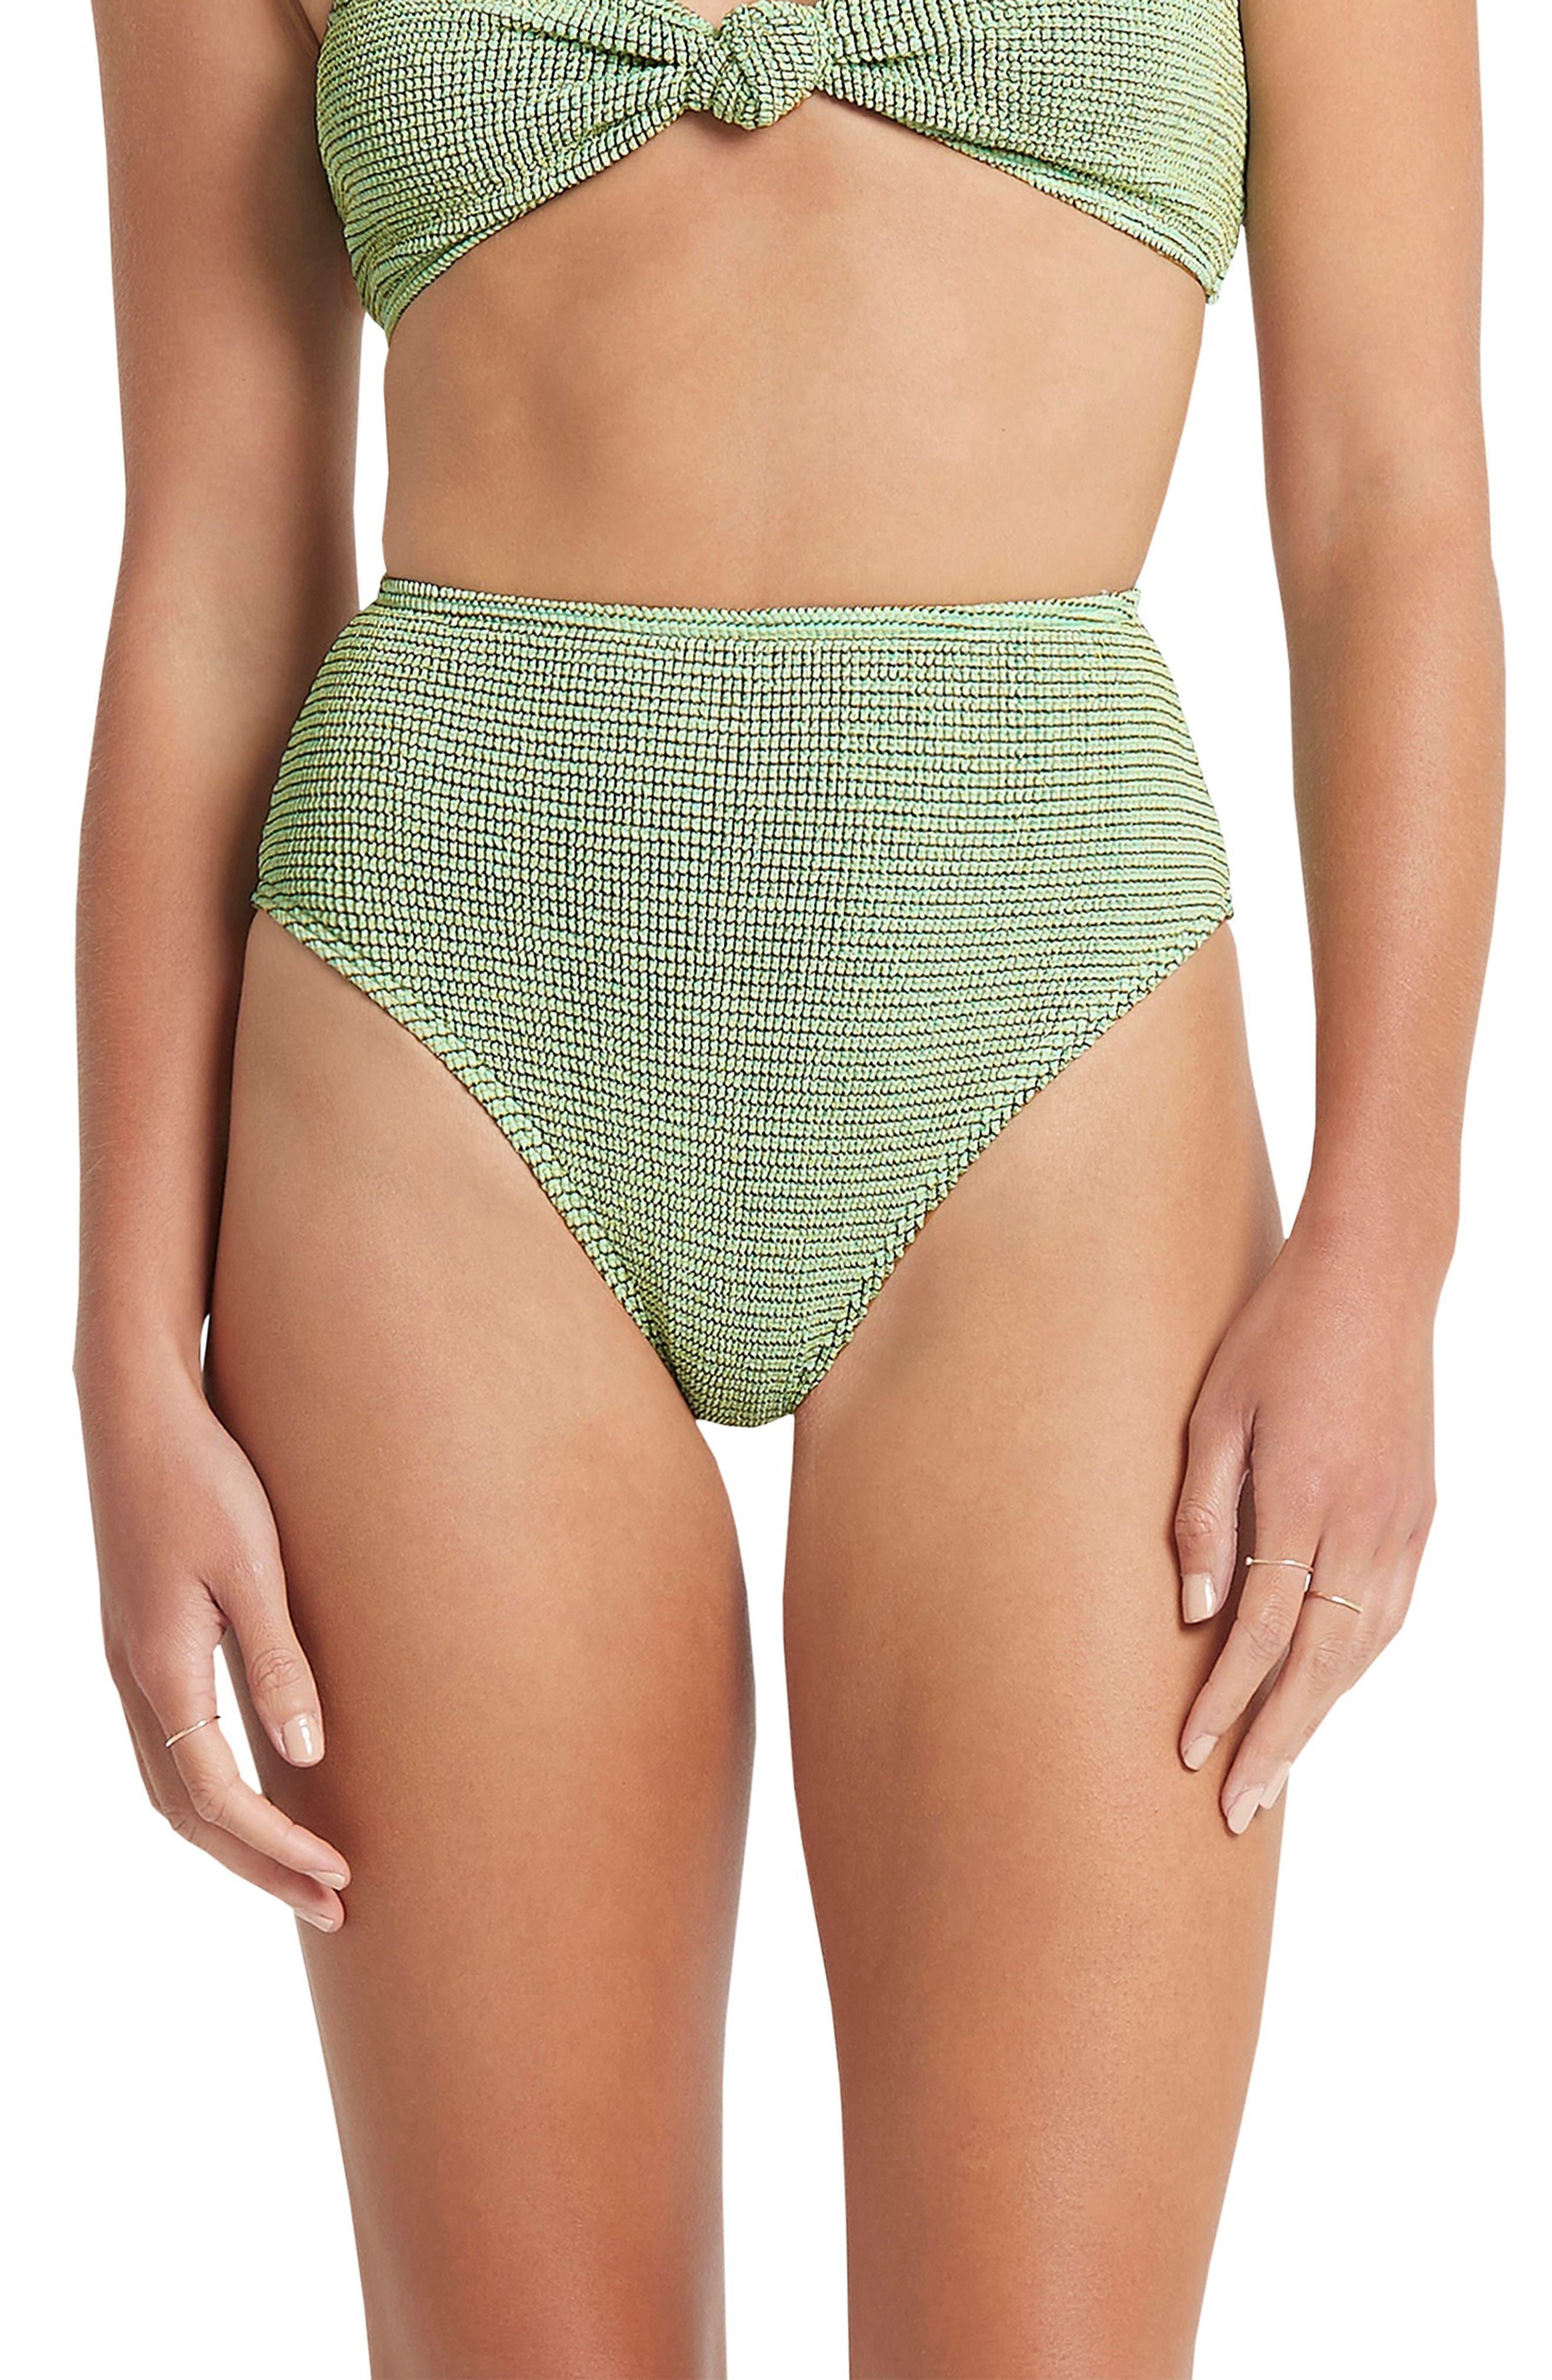 The Palmer Brief Bikini Bottoms